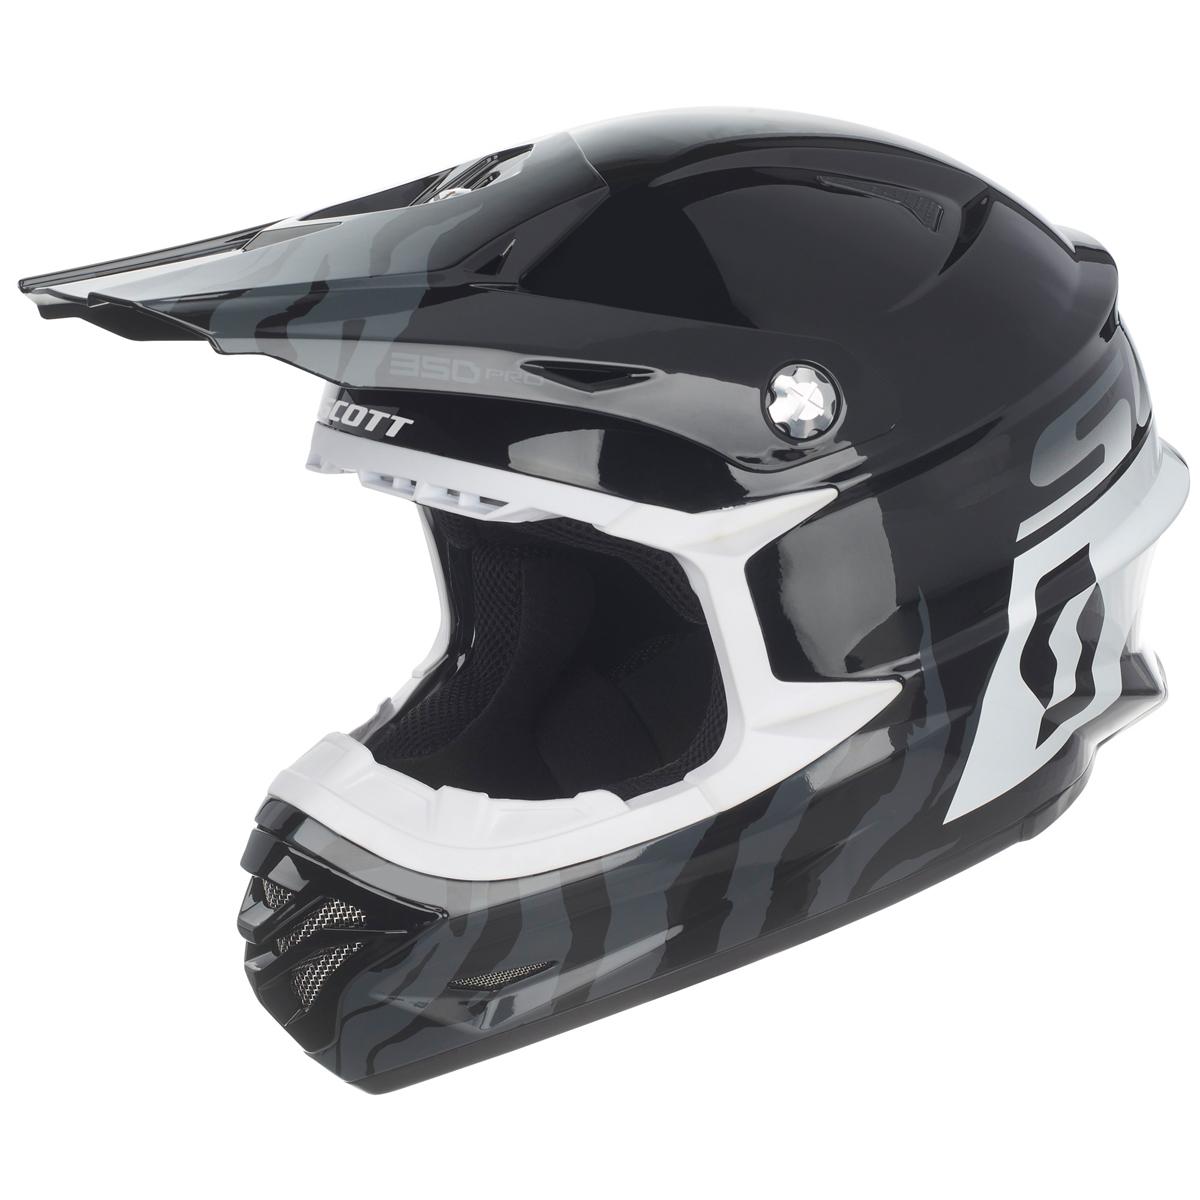 scott 350 pro track mx enduro motorrad bike helm schwarz. Black Bedroom Furniture Sets. Home Design Ideas